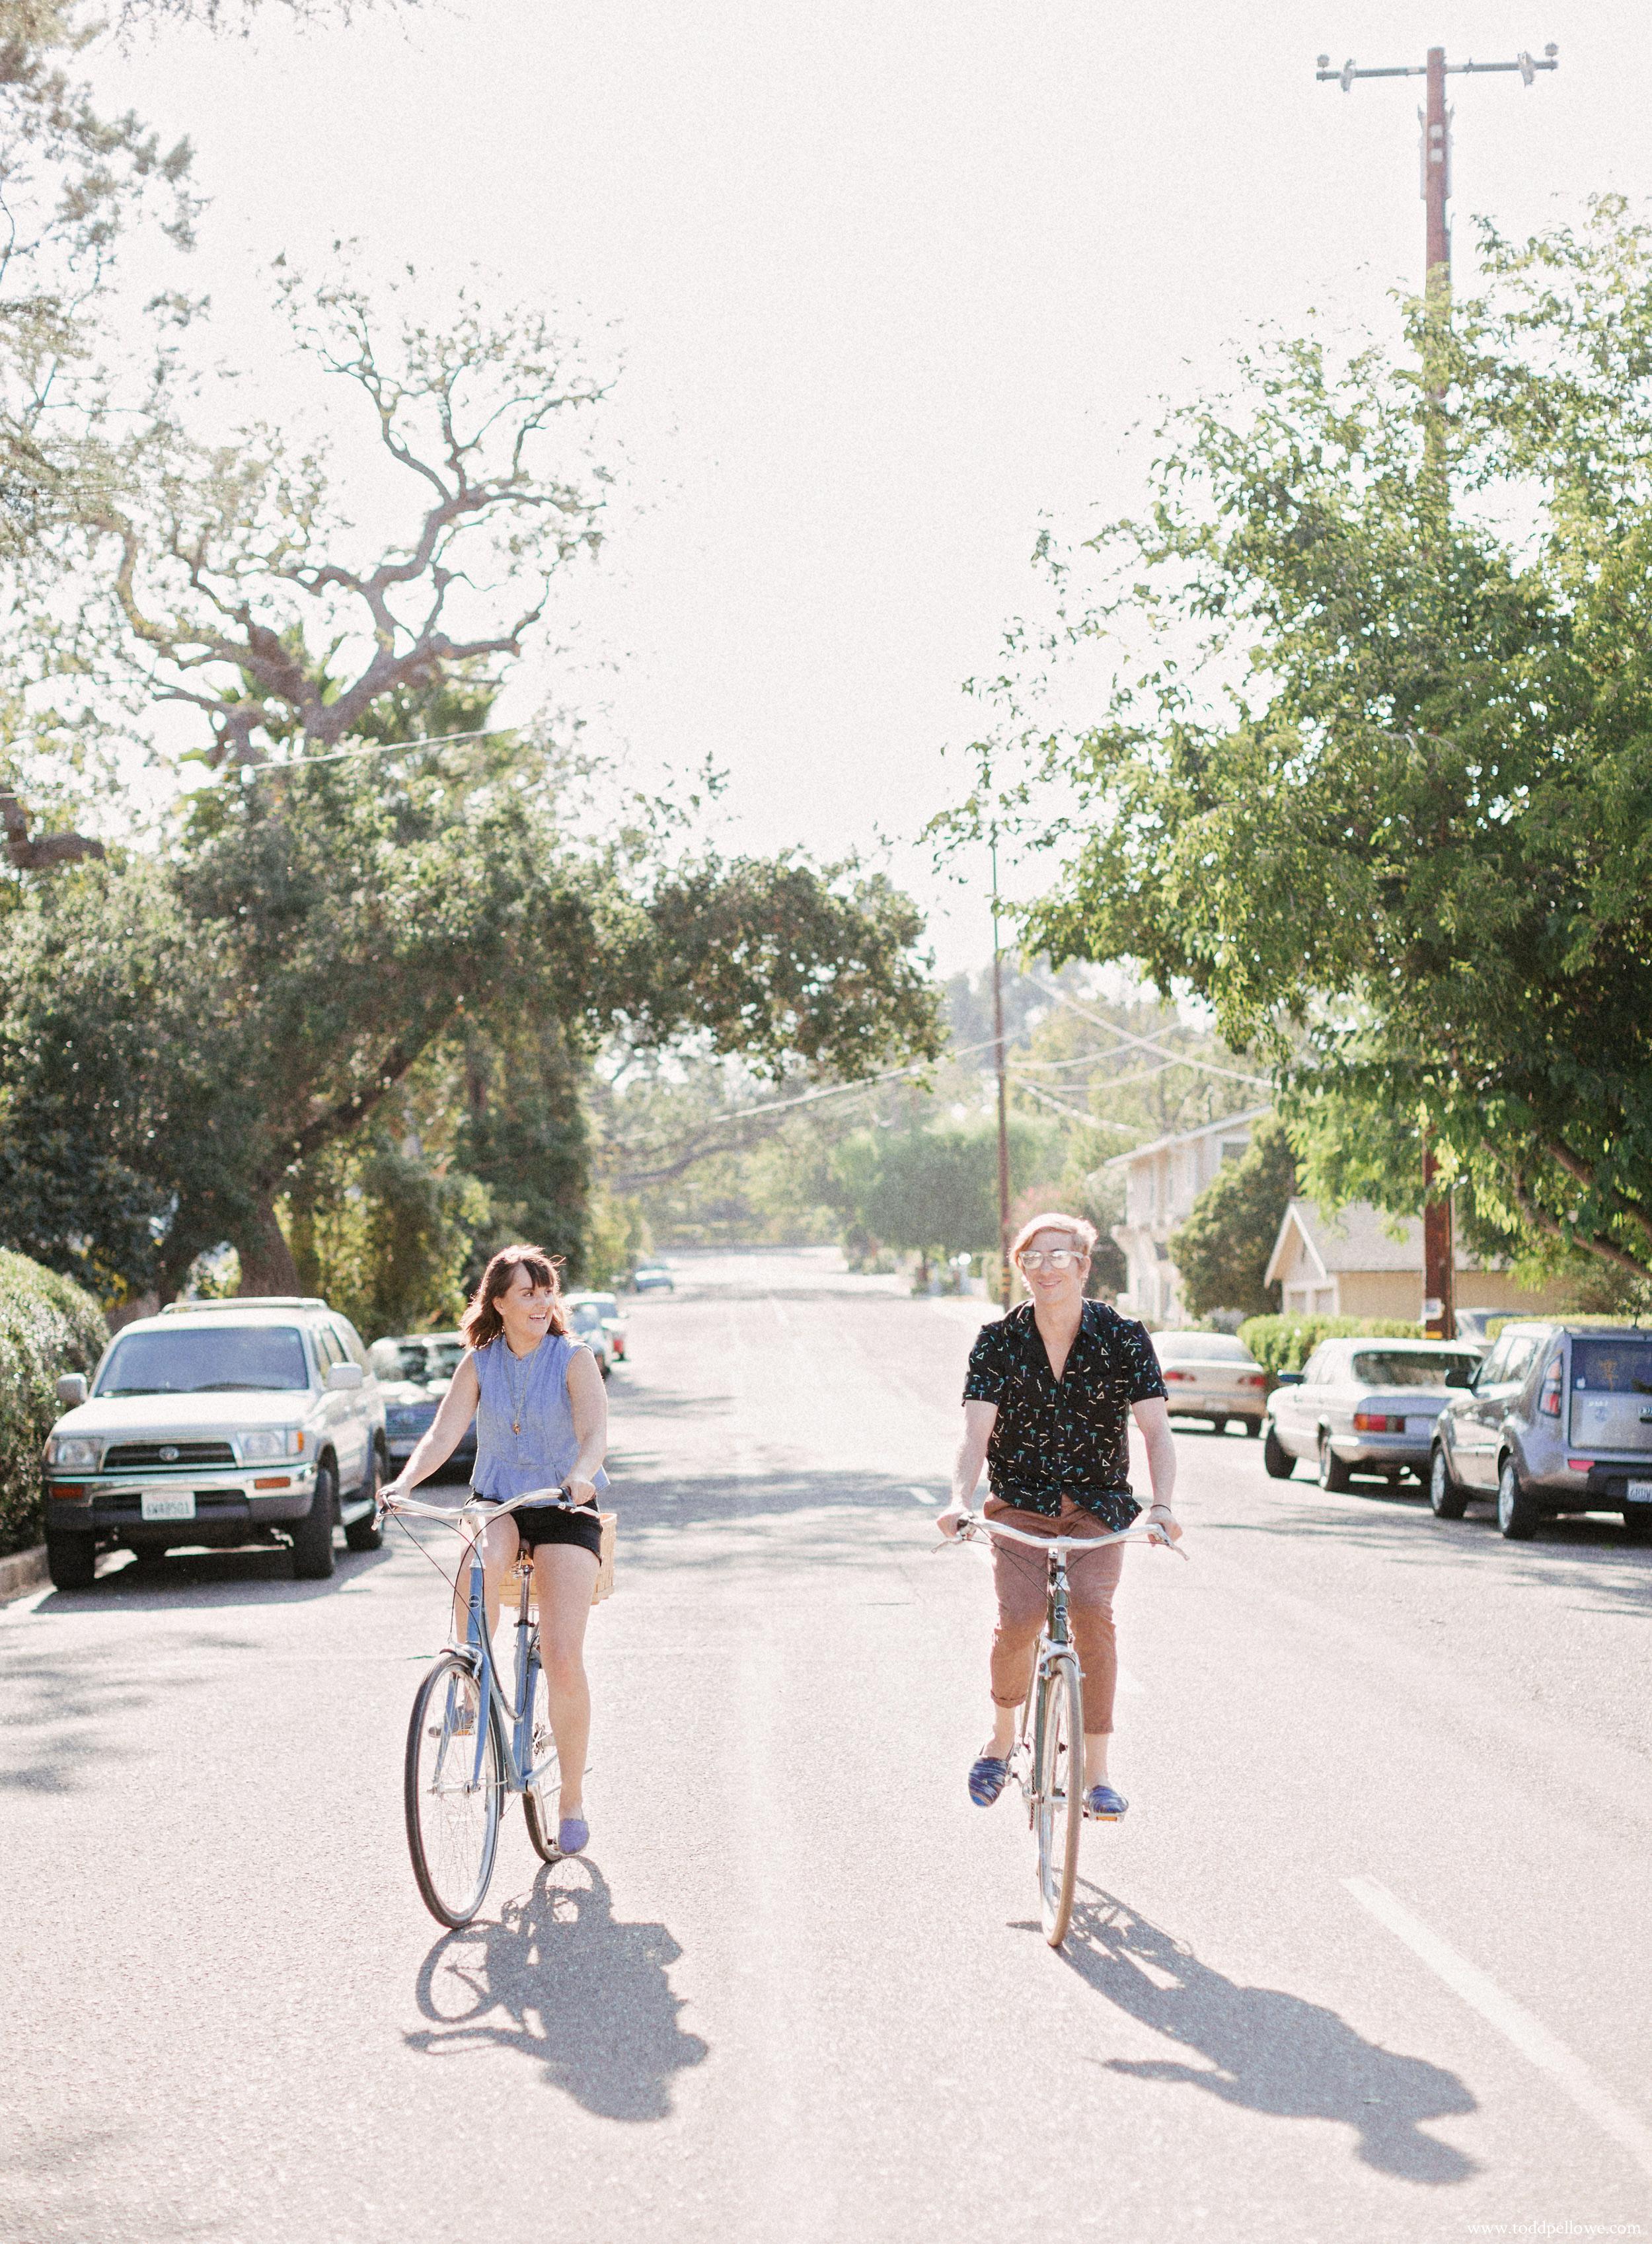 09-ojai-california-engagement-photography-005.jpg